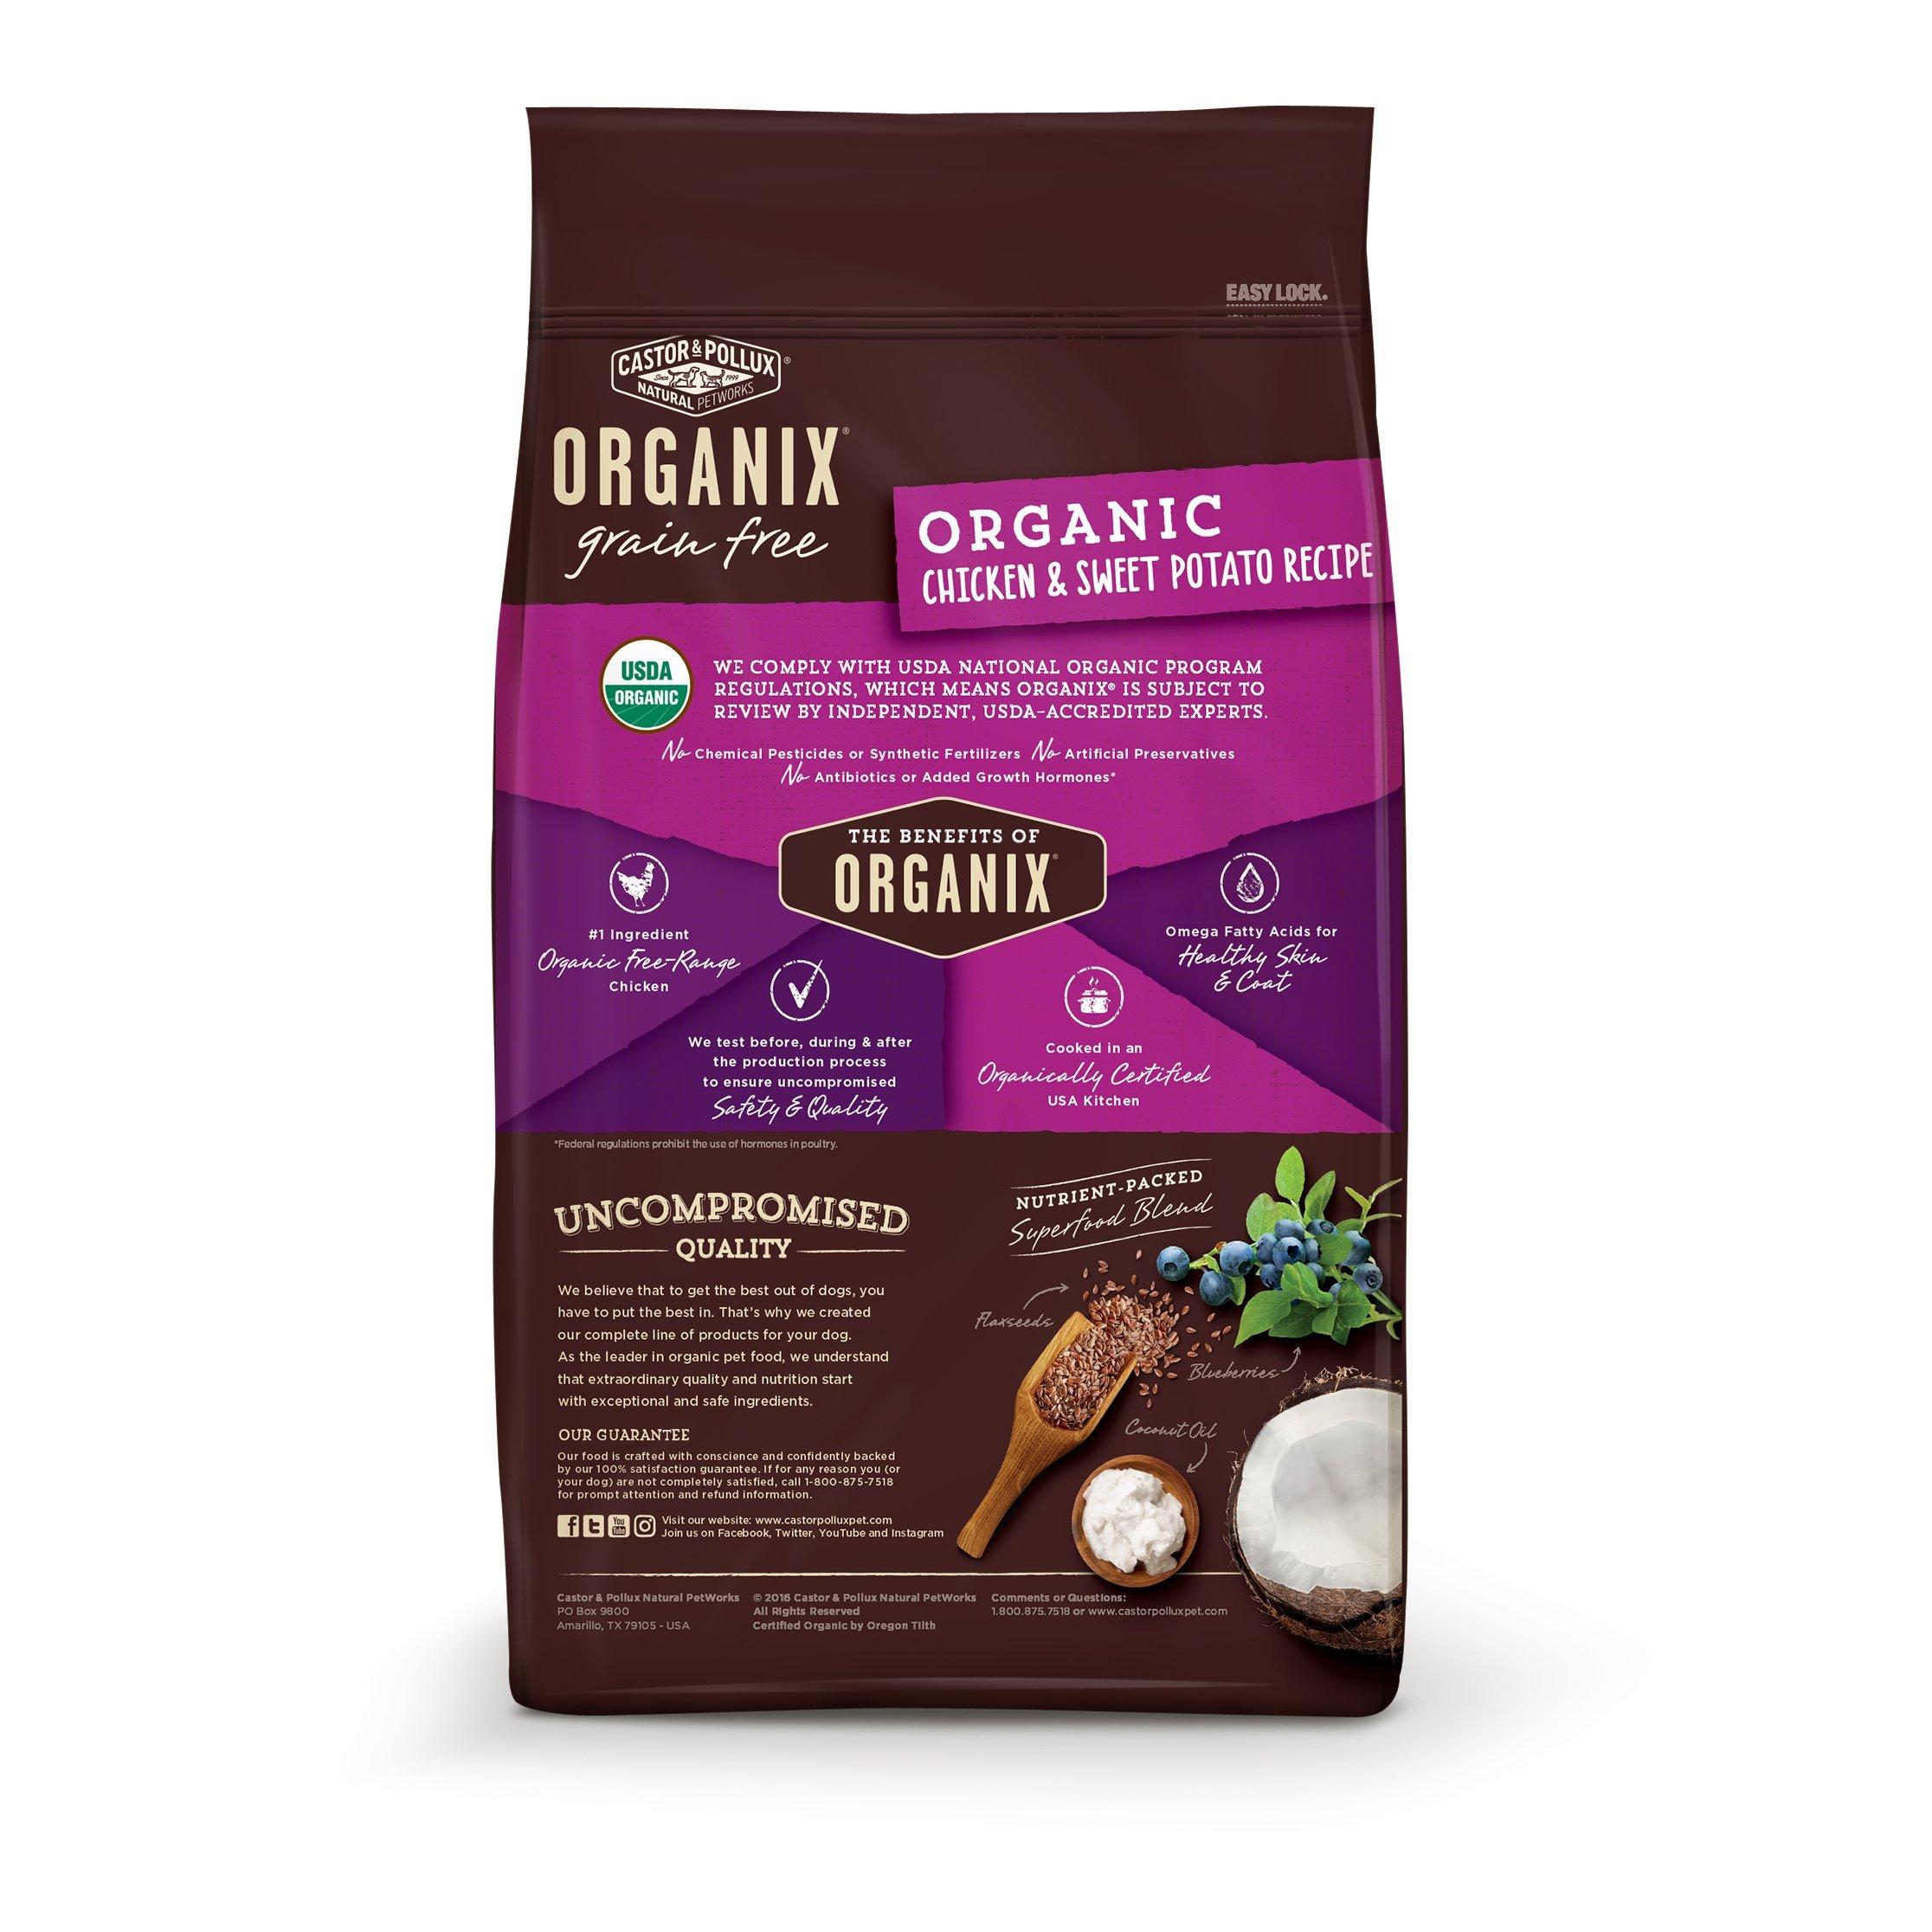 Castor & Pollux Organix Grain Free Organic Chicken & Sweet Potato Recipe Dry Dog Food 18Lbs by Castor & Pollux (Image #2)